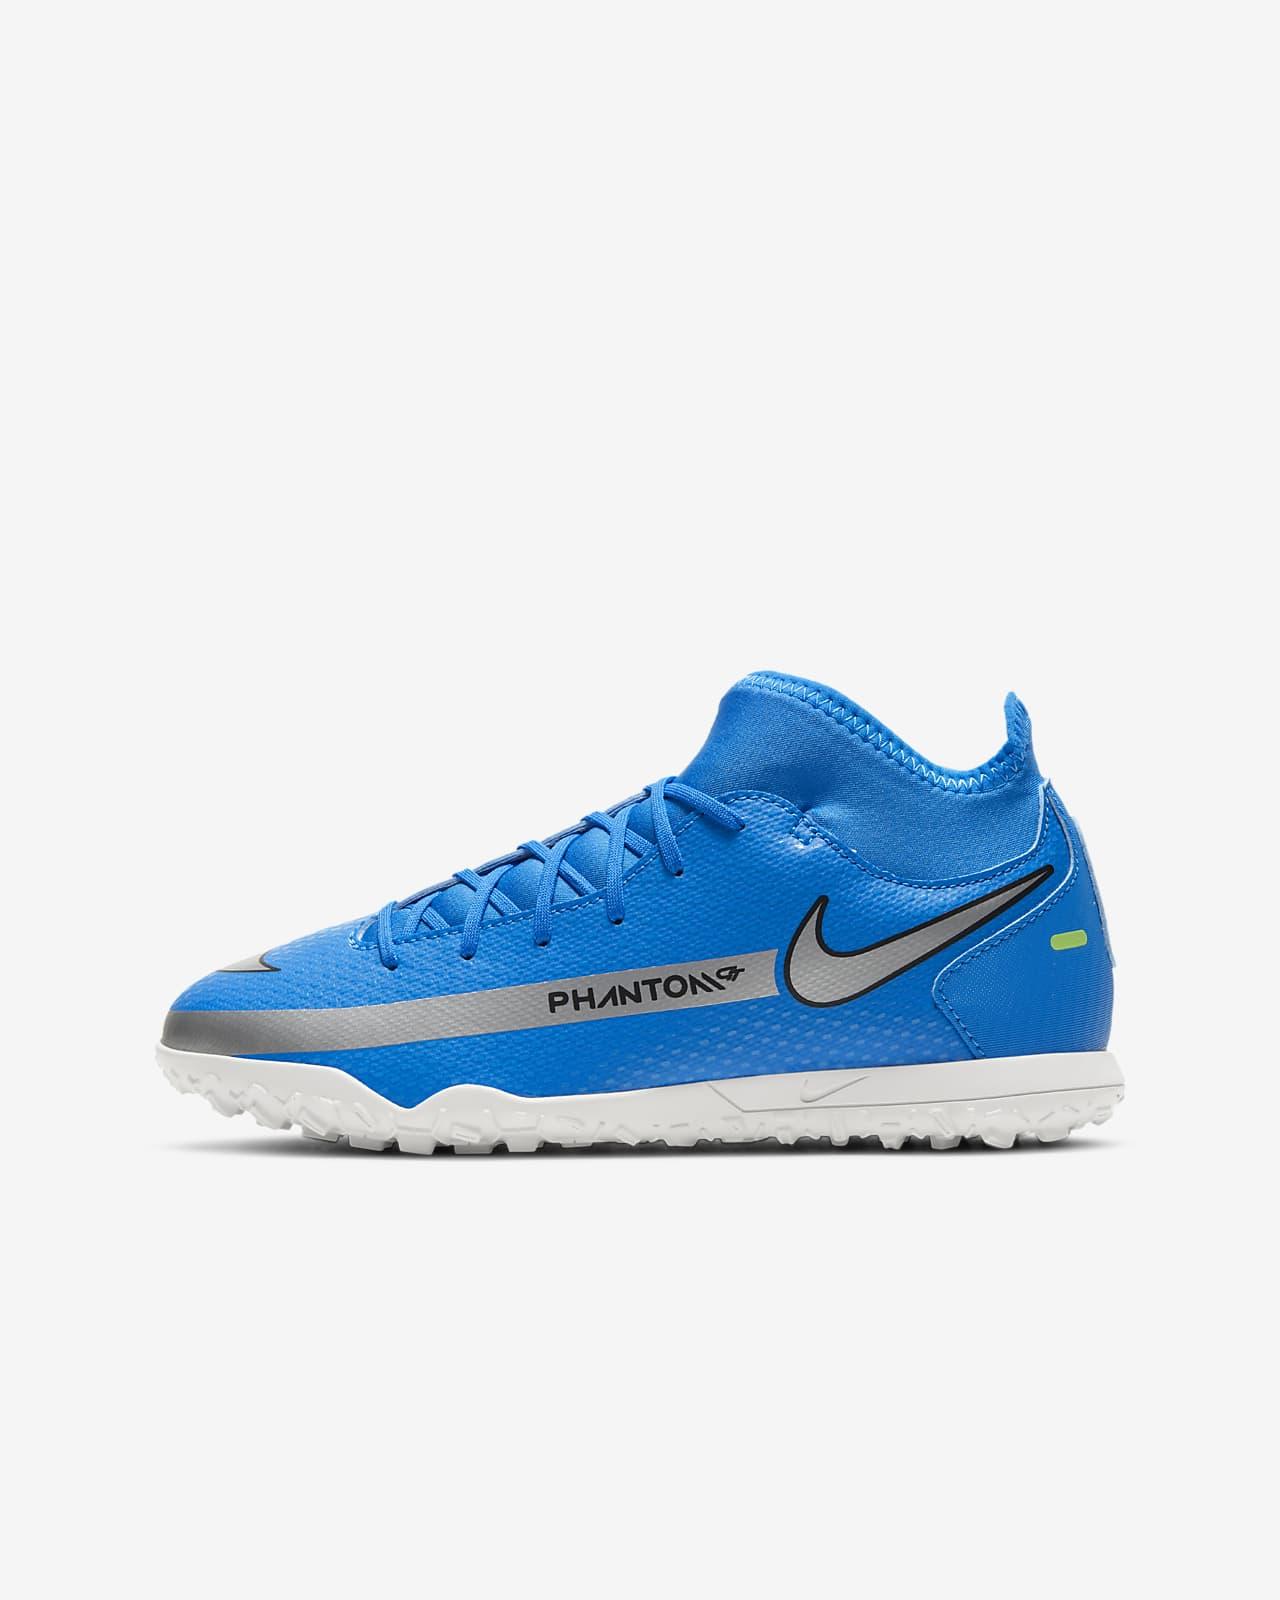 Calzado de fútbol para pasto deportifvo artificial (turf) para niños talla pequeña/grande Nike Jr. Phantom GT Club Dynamic Fit TF